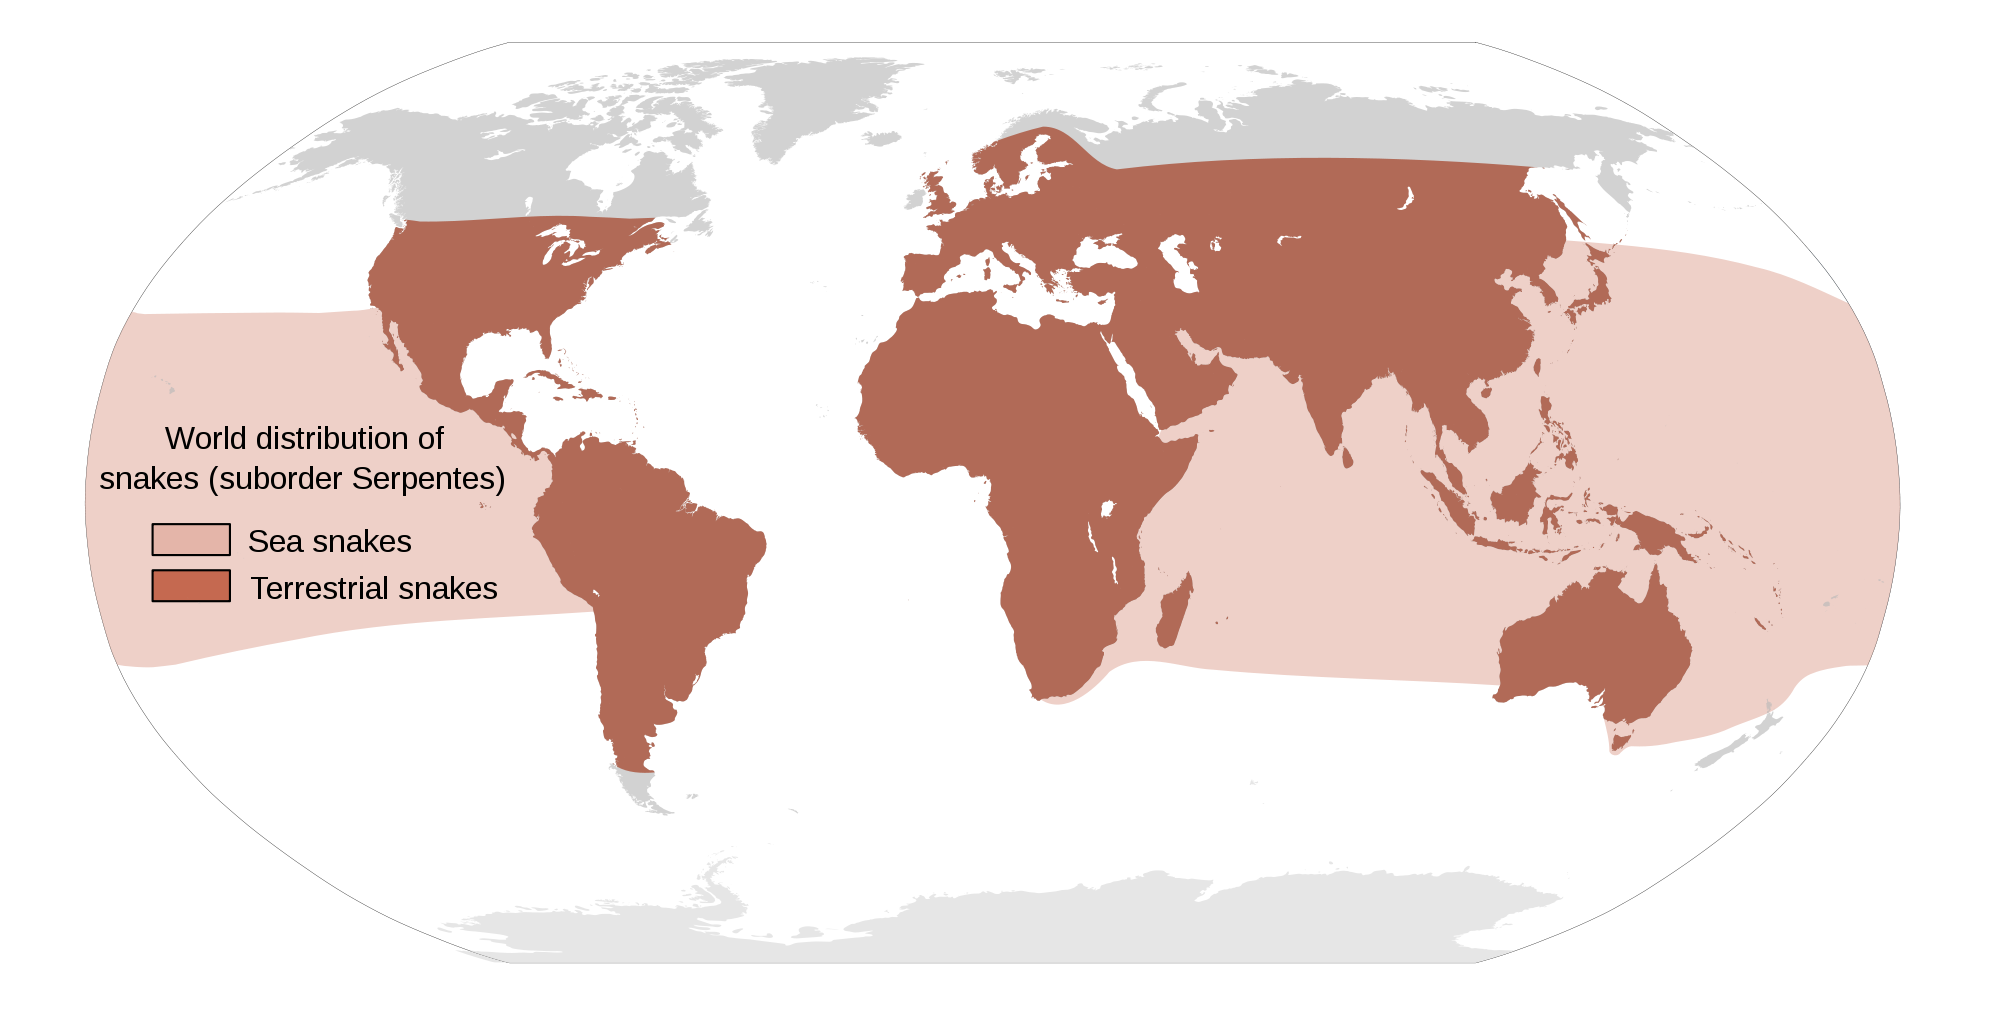 Epidemiology of snakebites wikipedia. Geography clipart mountain habitat